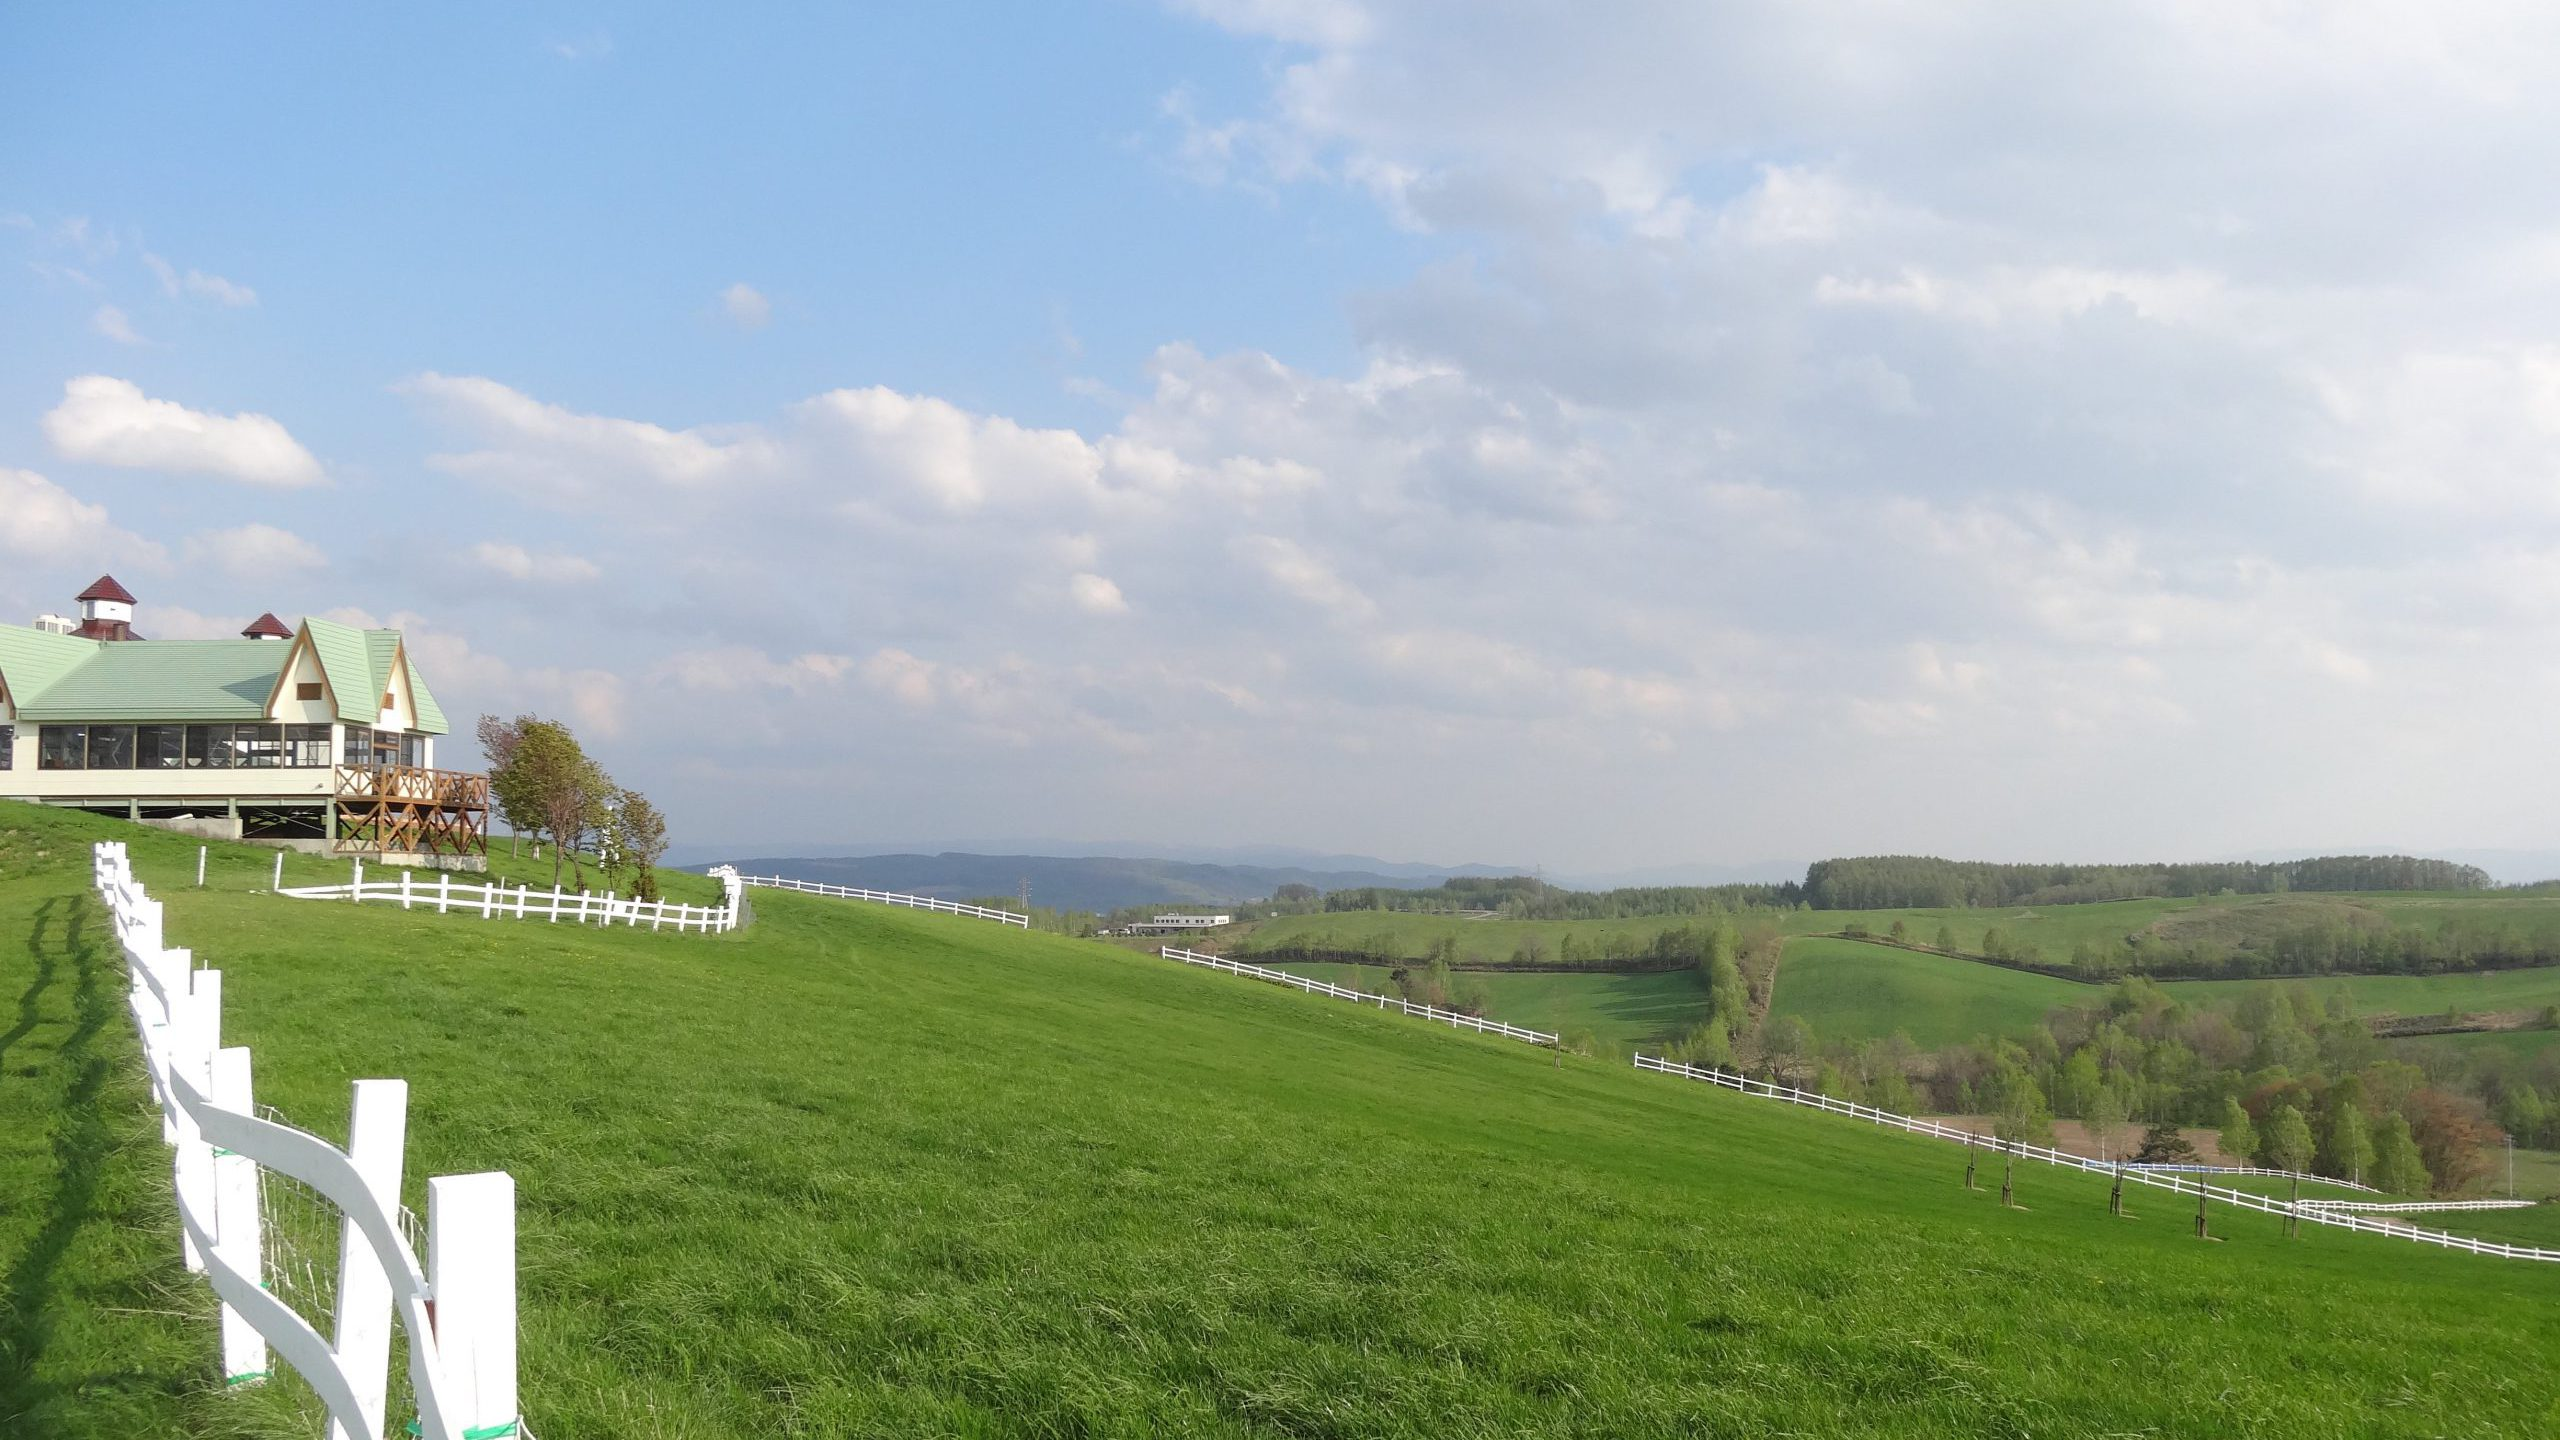 Shibetsu Rural Landscapes